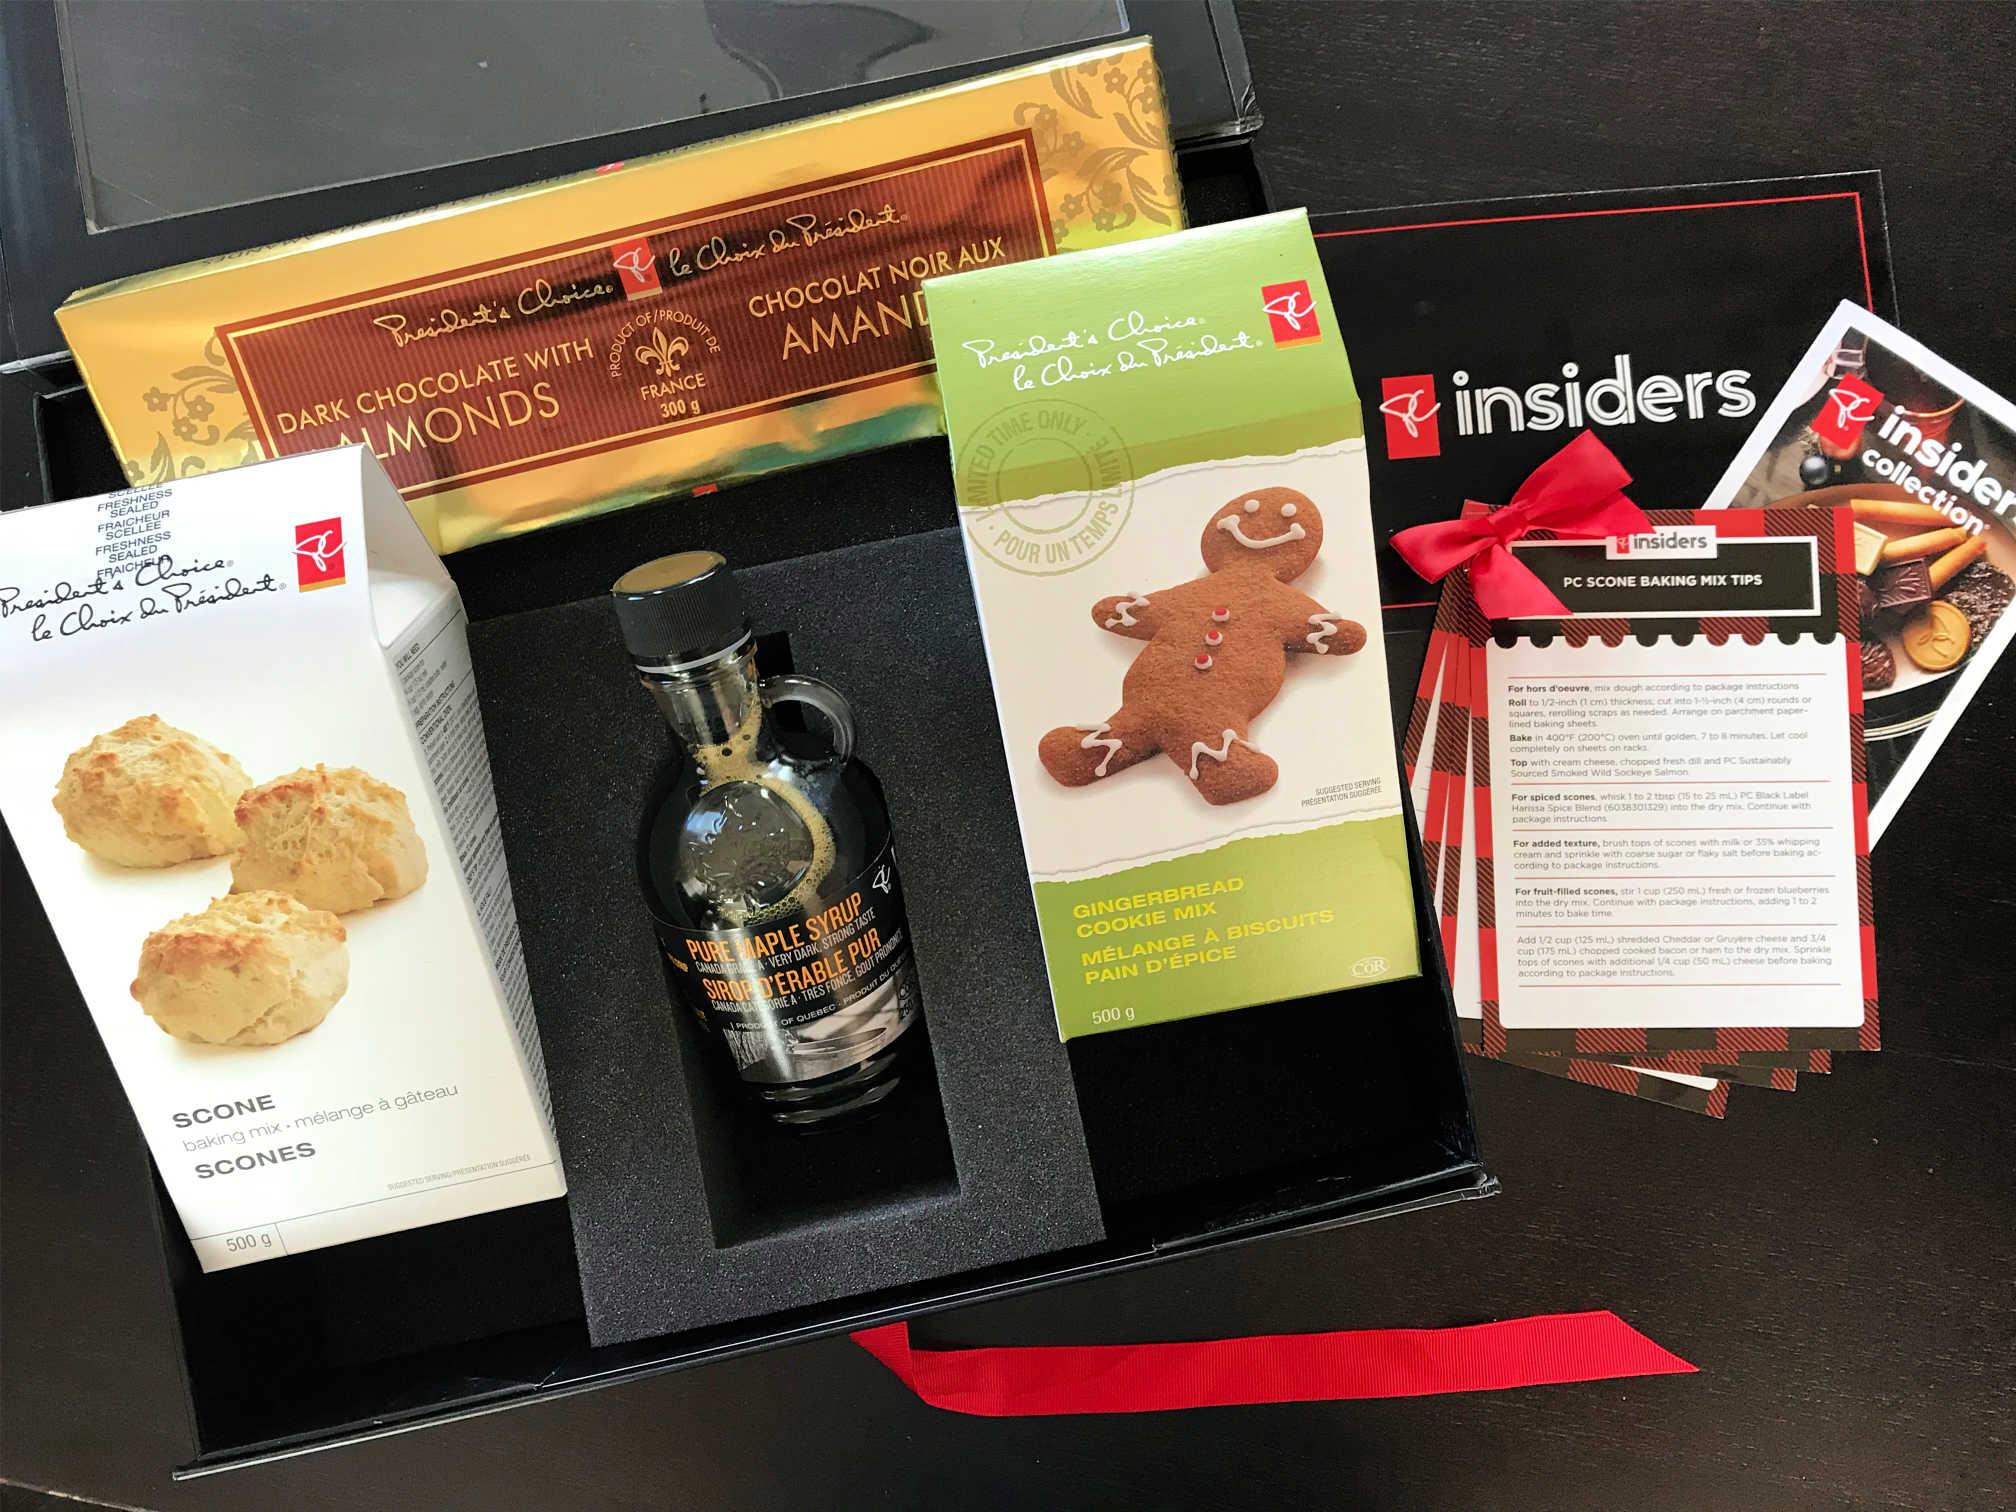 PC Insider Surprise Box